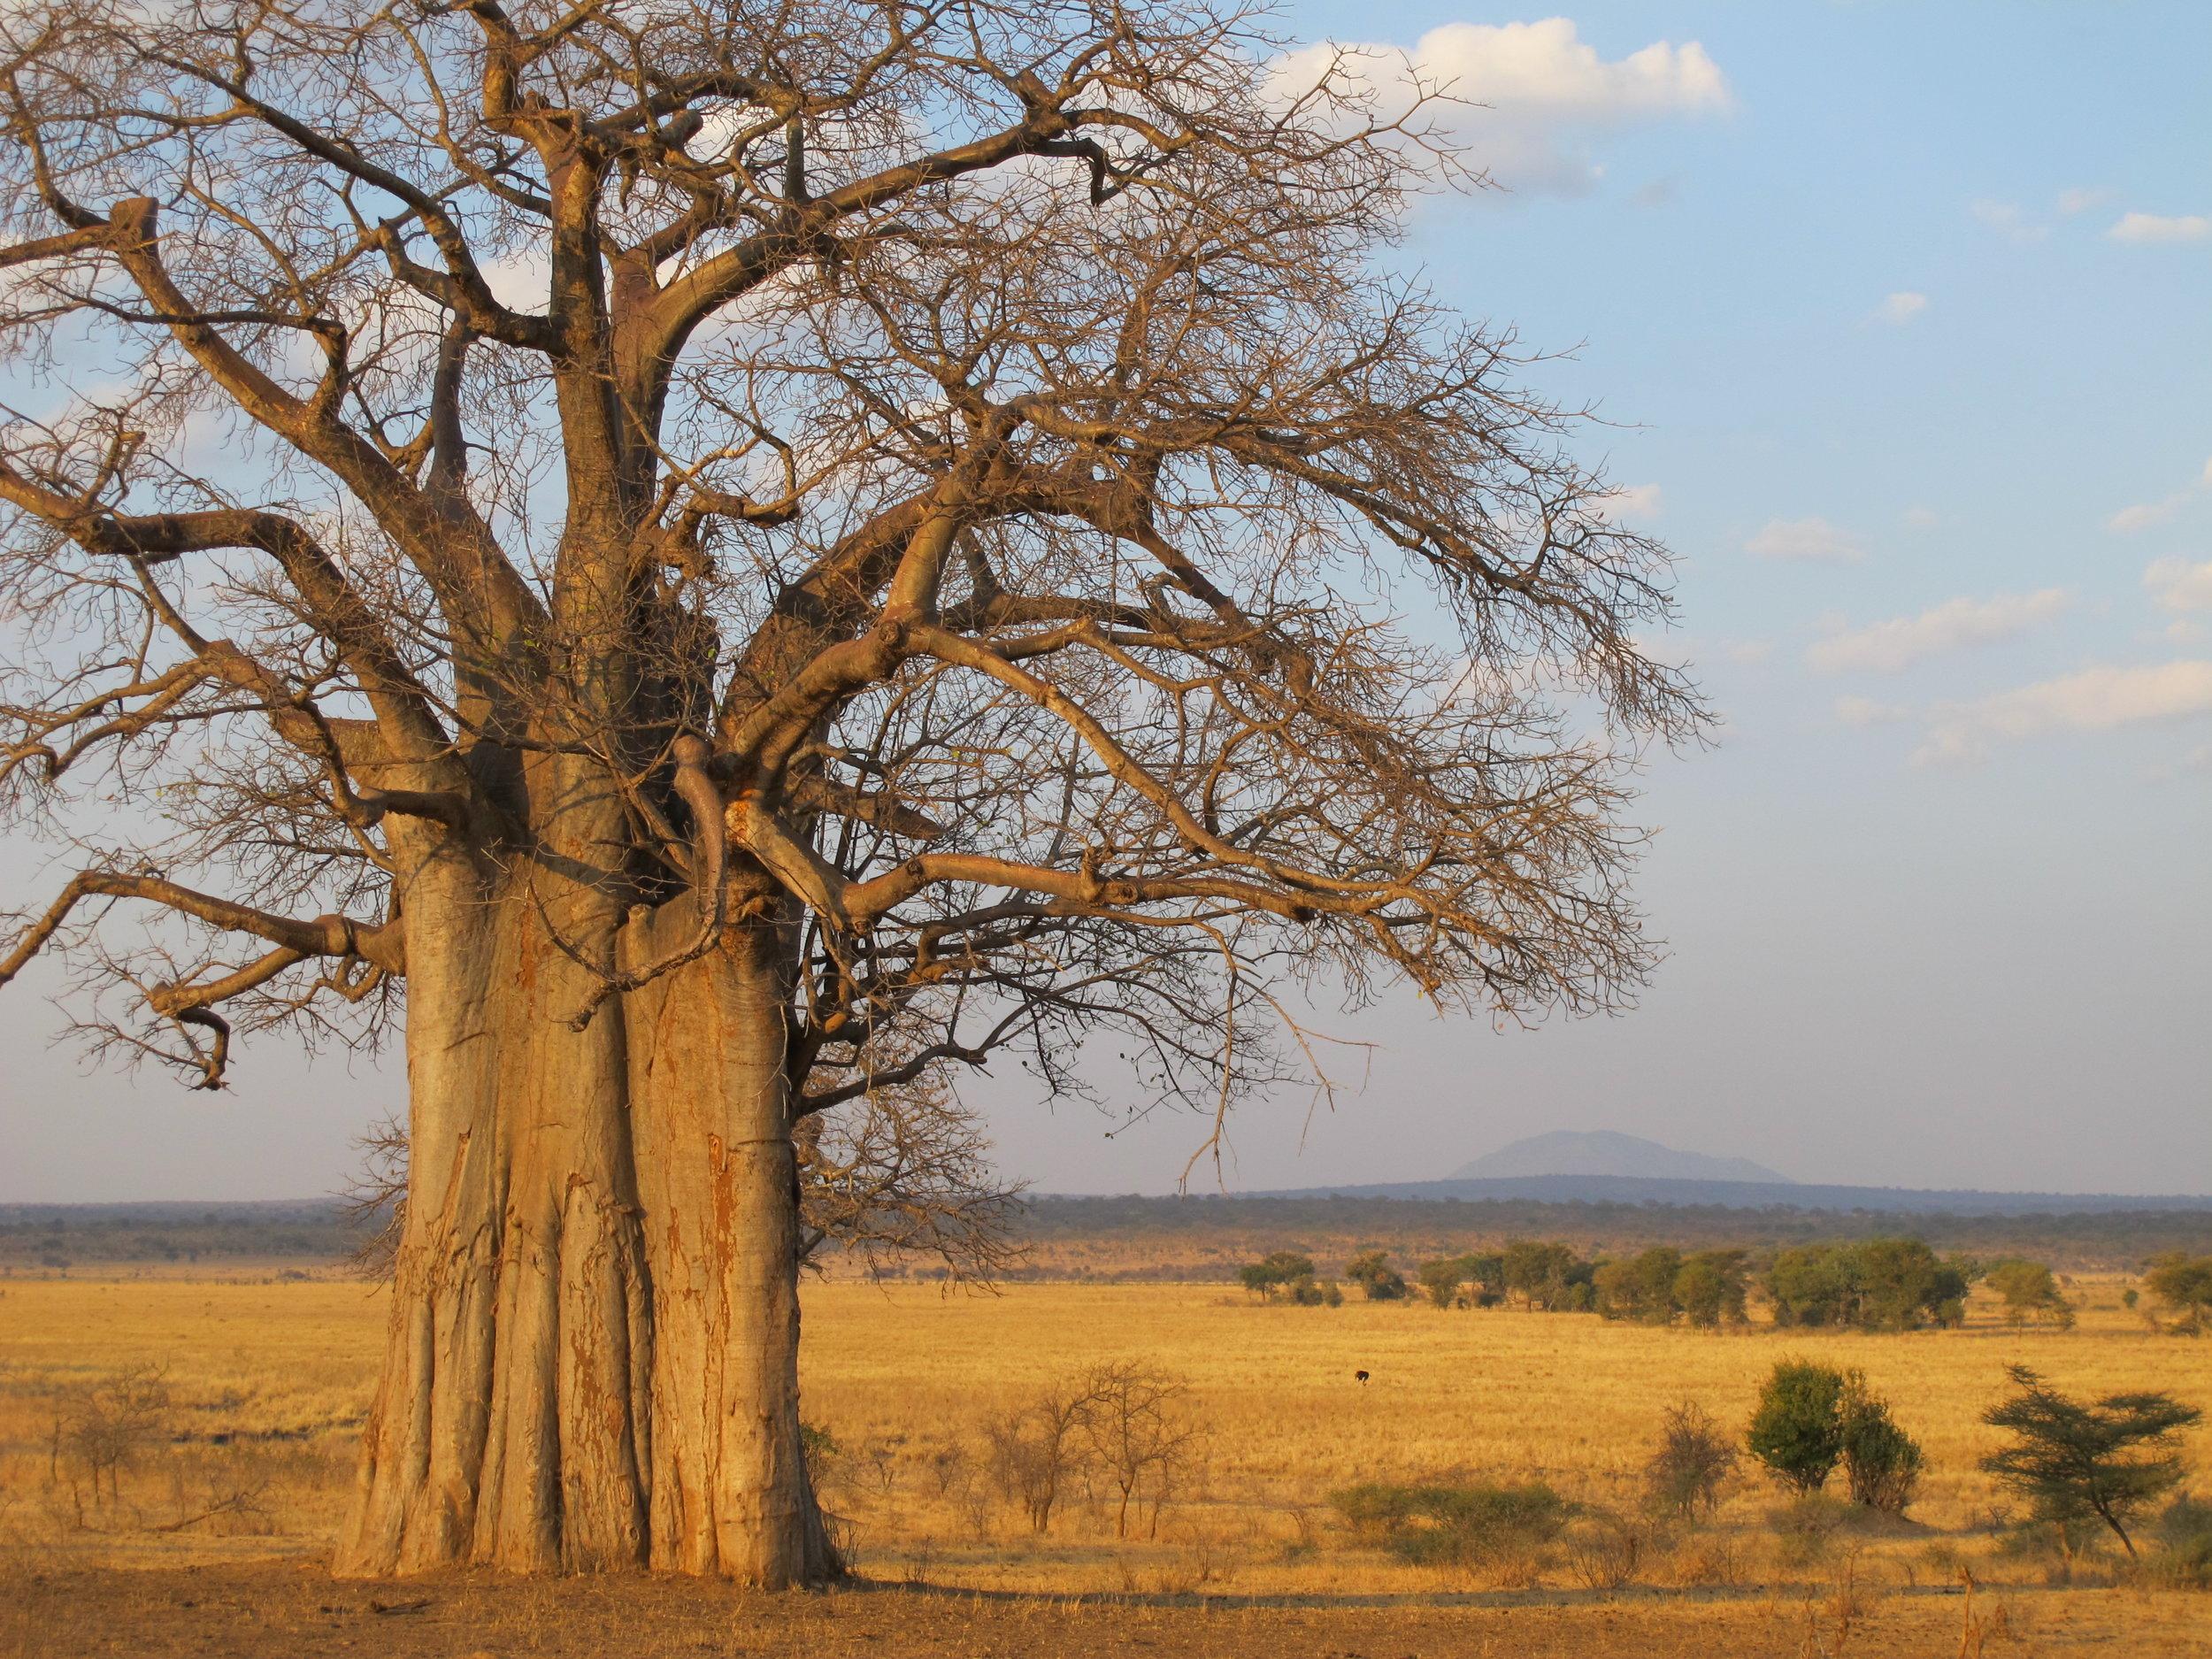 africa photo safari-tarangire-park8a.jpg